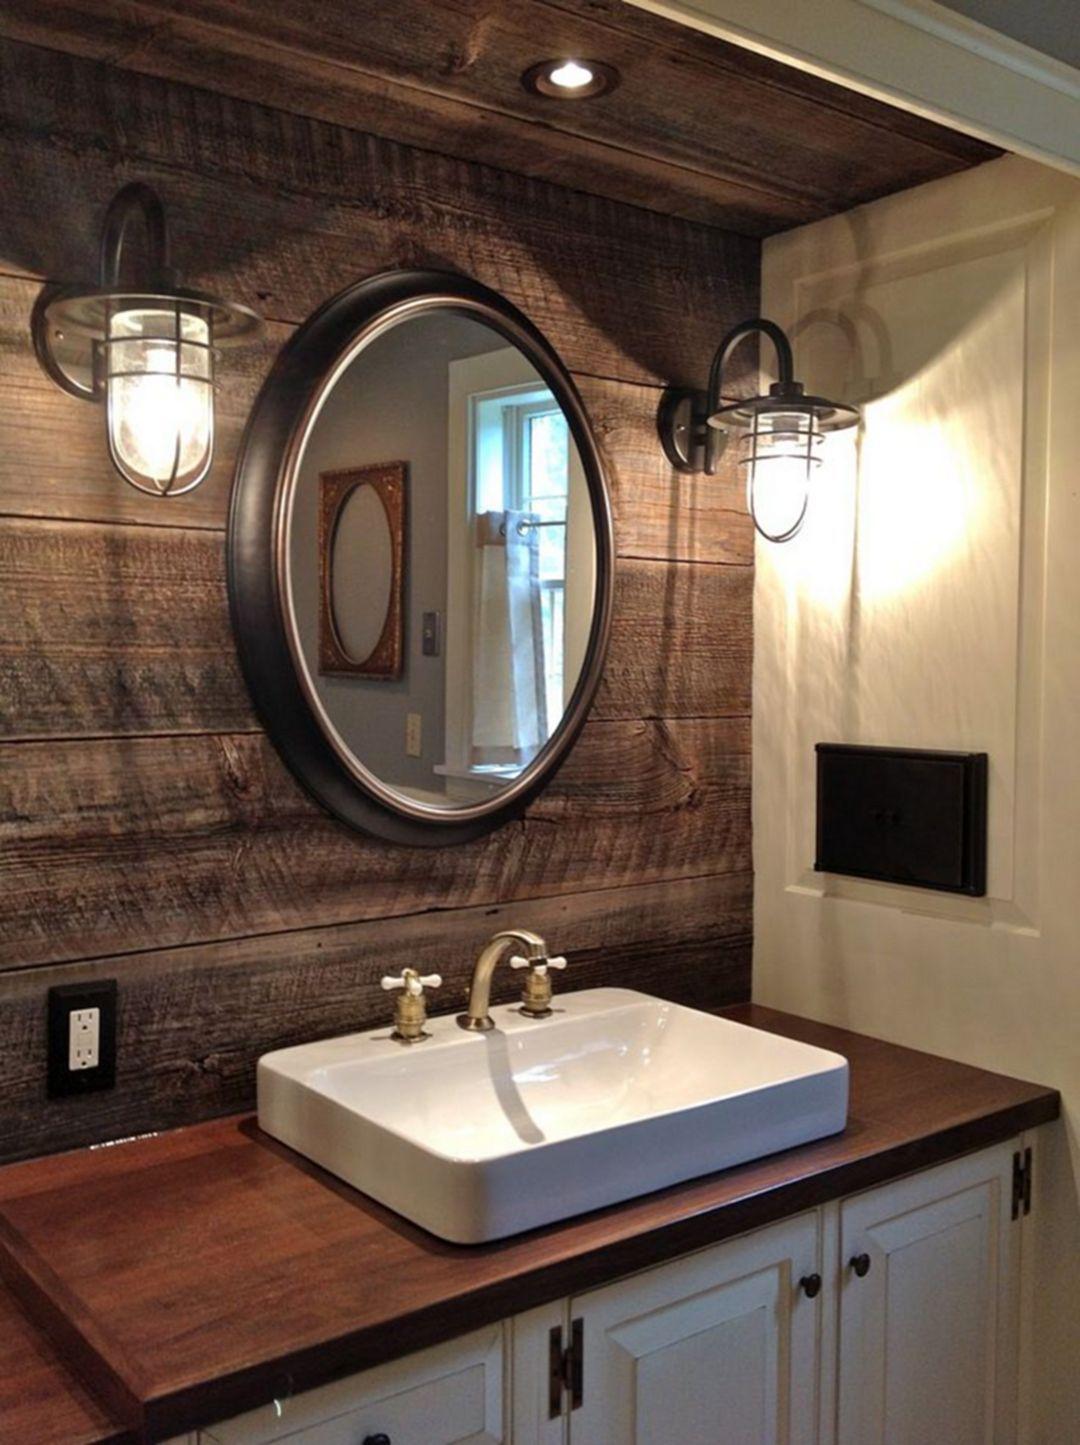 Breathtaking 25 Best Pirate Bathroom Design Decor Ideas For Your Kids Https Decorathing Bathroom Design Decor Farm Style Bathrooms Farmhouse Bathroom Decor